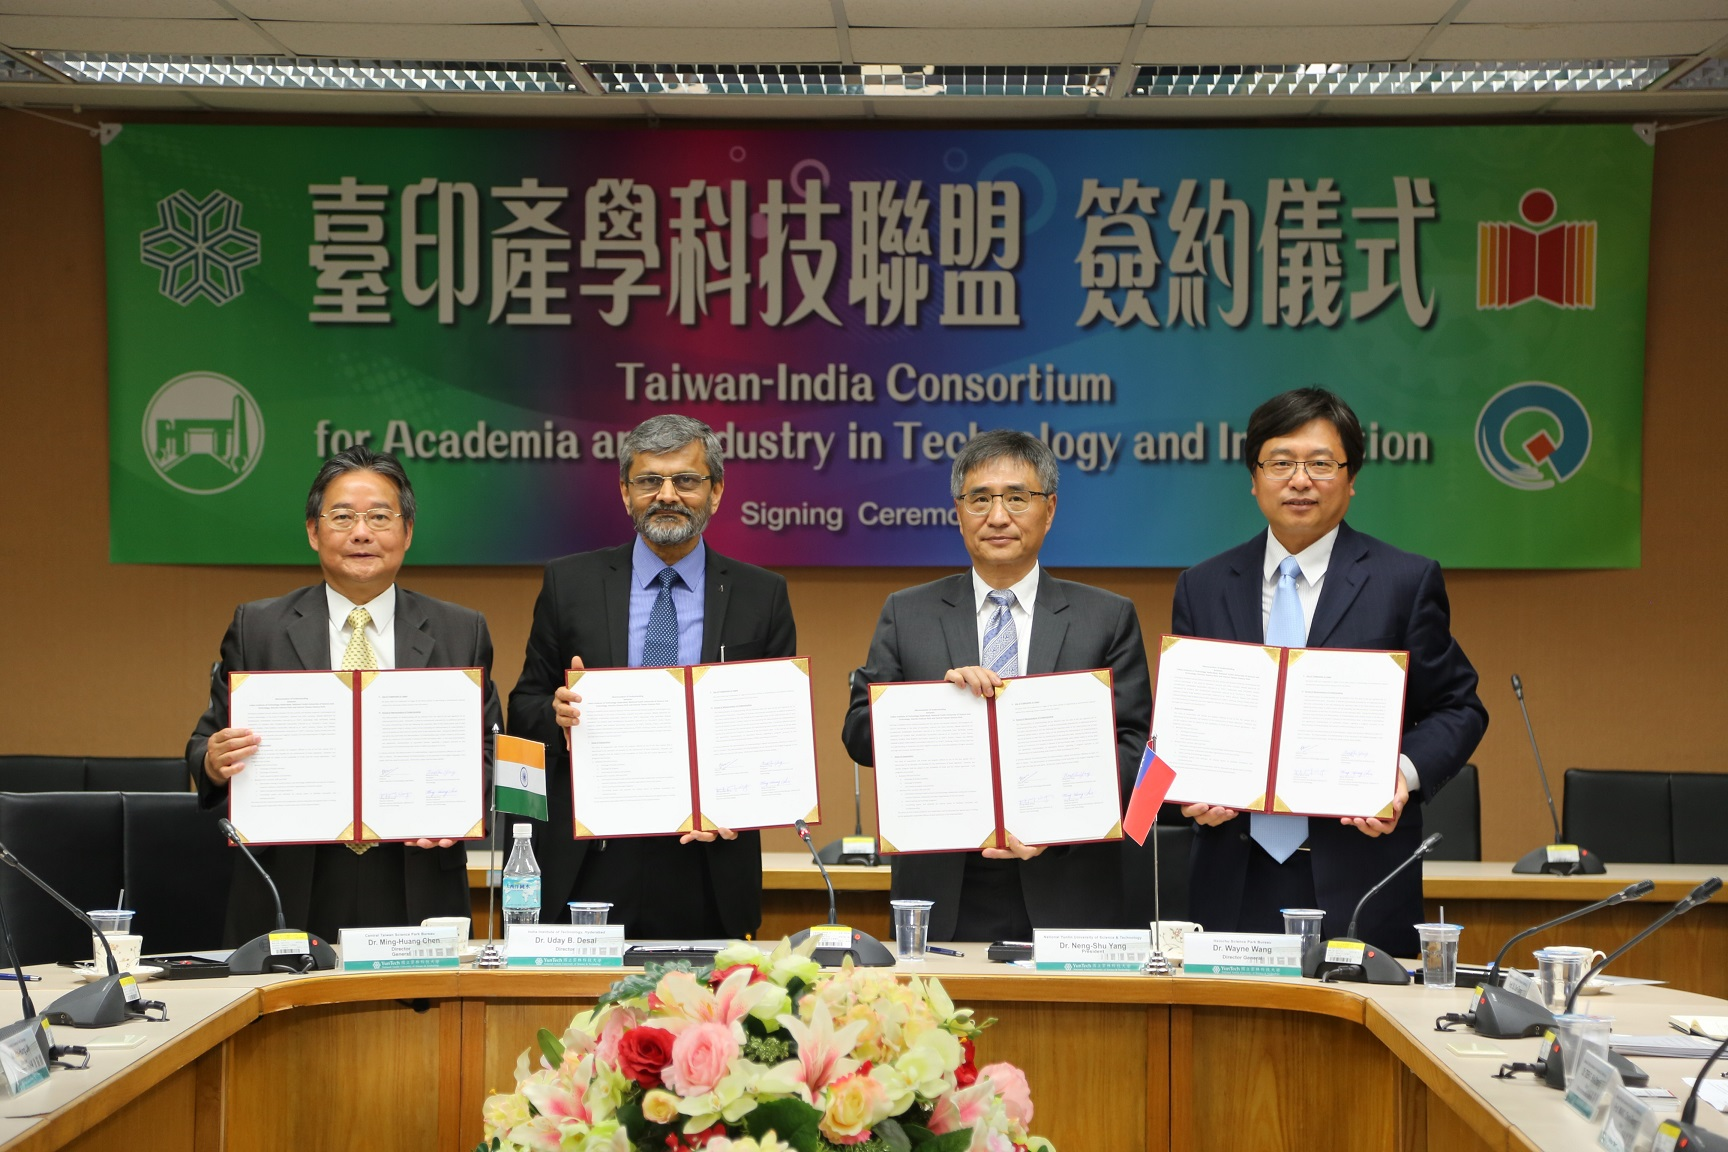 Chen Ming-huang, Uday B. Desai, Yang Neng-shu and Wayne Wang (Image from MOFA)